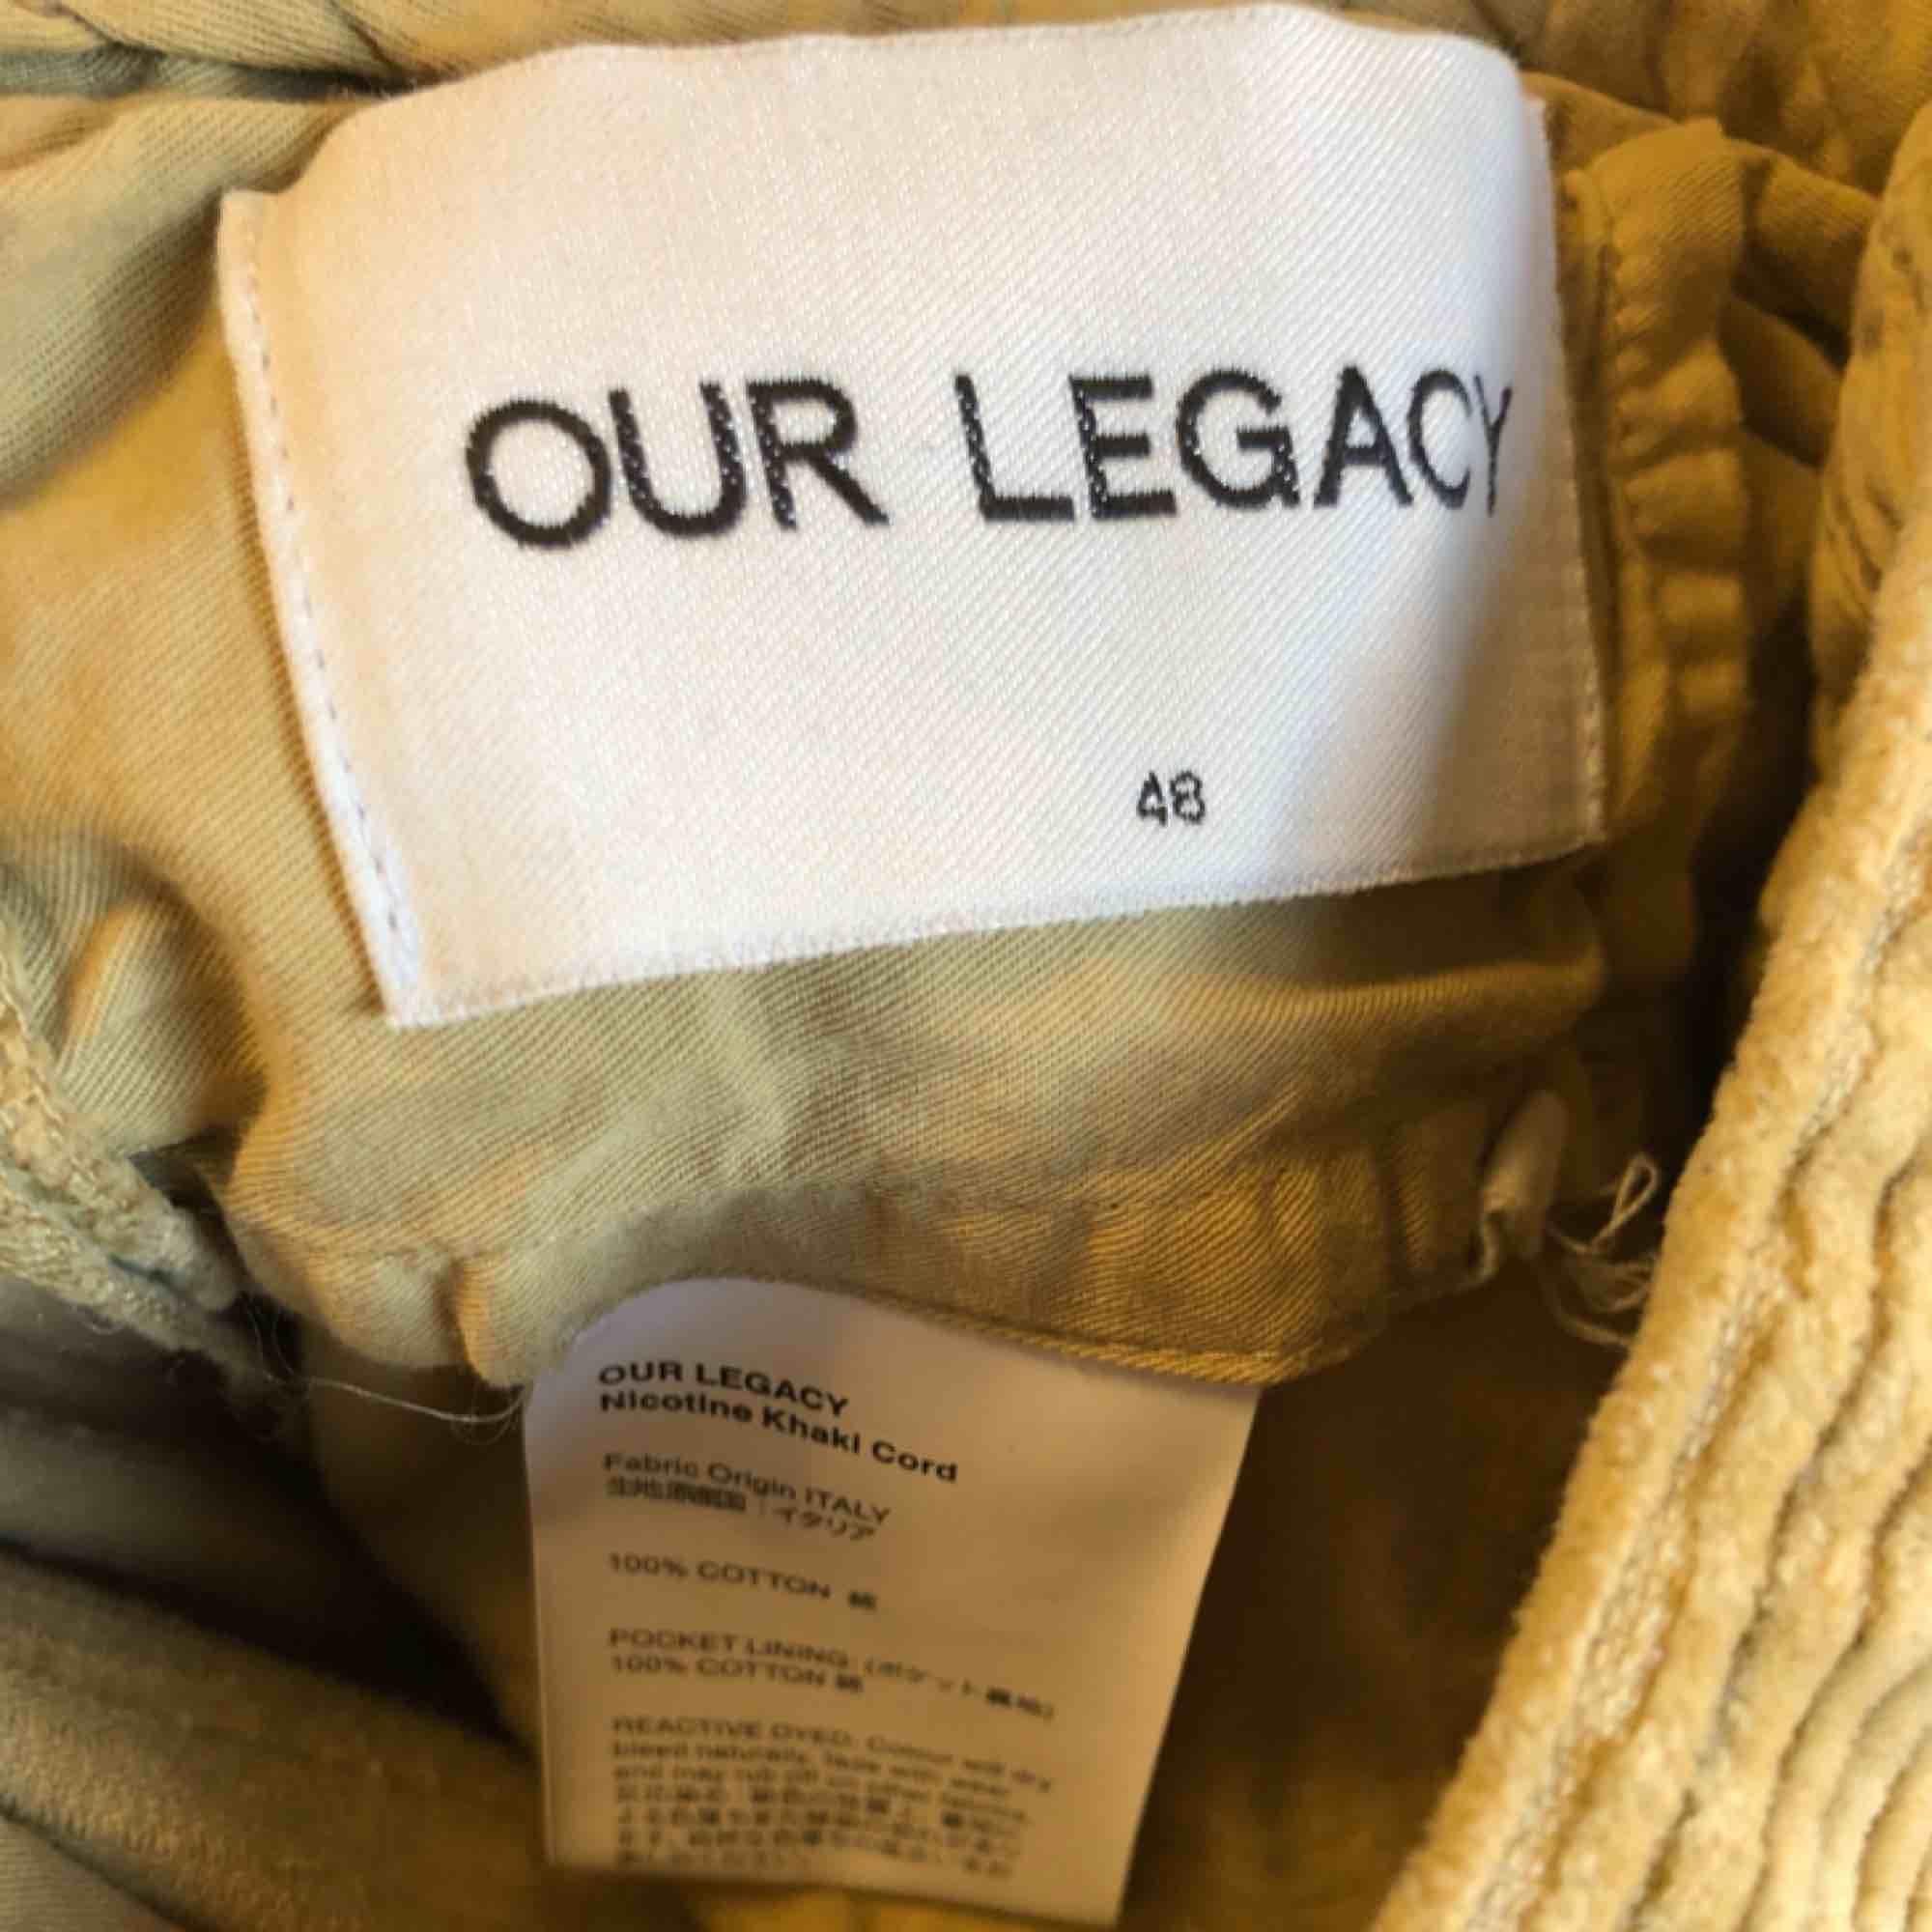 Senapsgula manchesterbyxor från Our legacy, som nya. Jeans & Byxor.